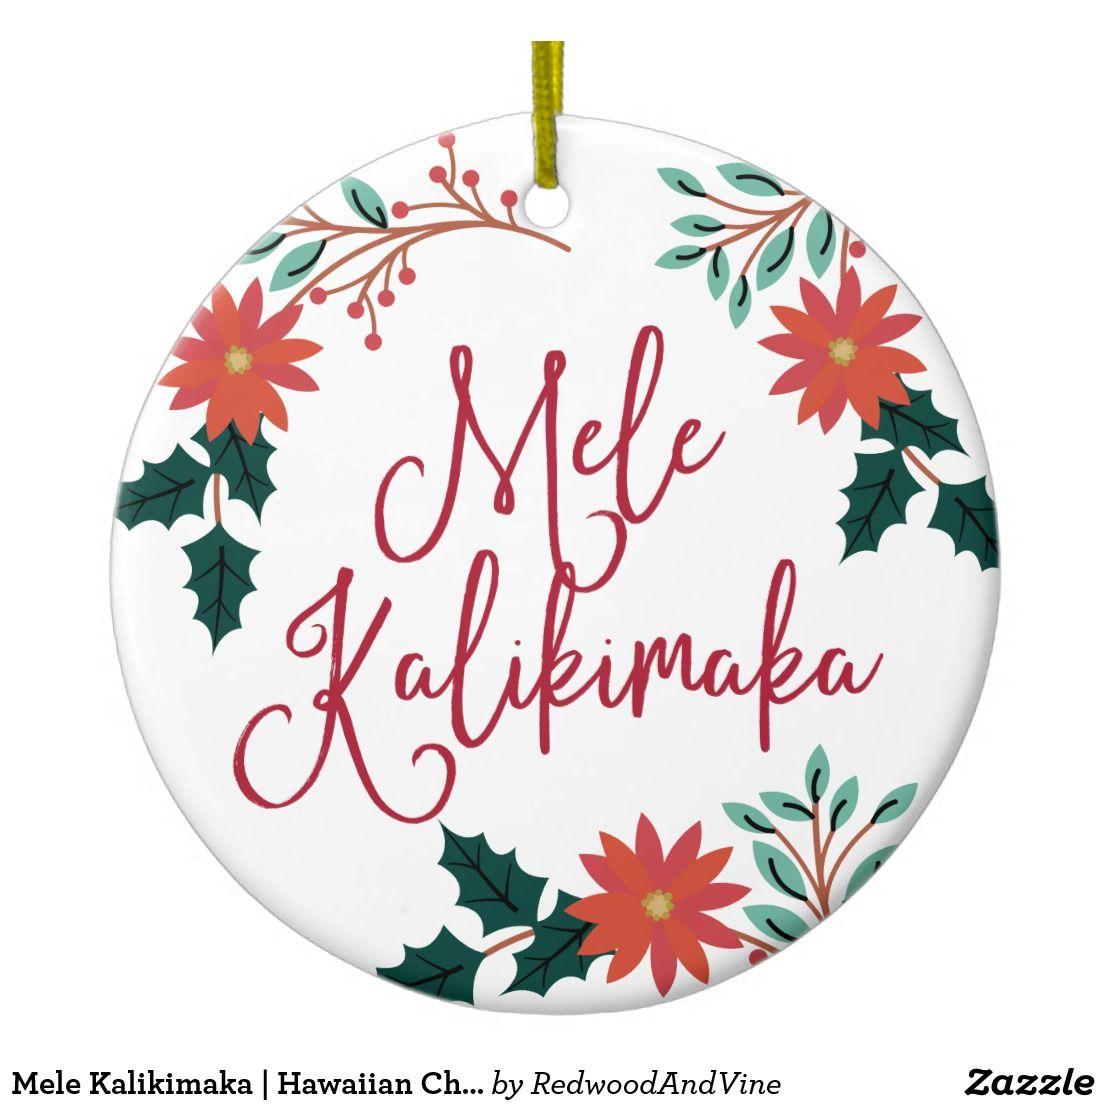 Mele Kalikimaka Hawaiian Christmas Ceramic Ornament Poinsettia